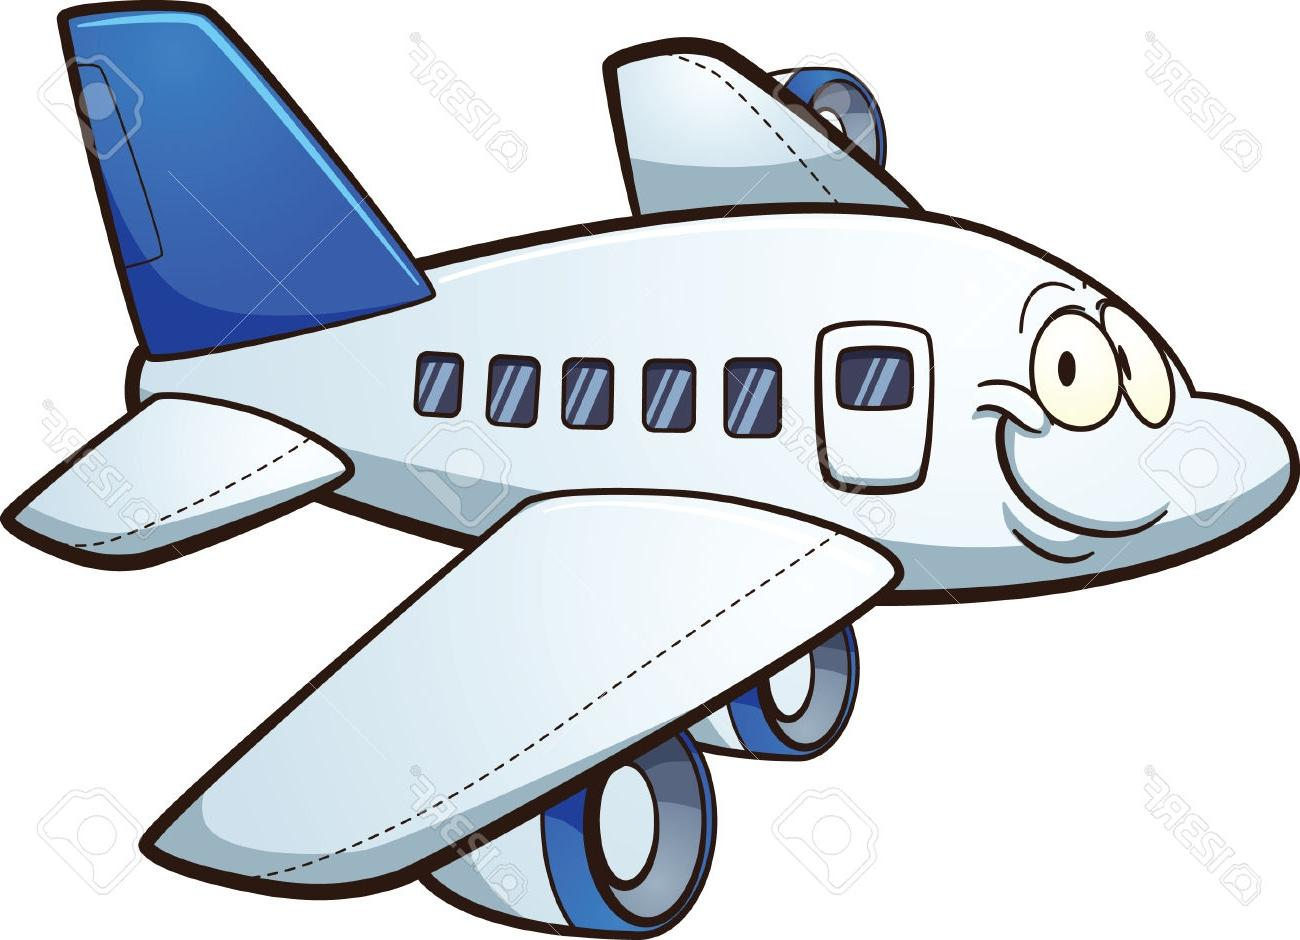 Top Plane Clip Art Design » Free Vector Art, Images.